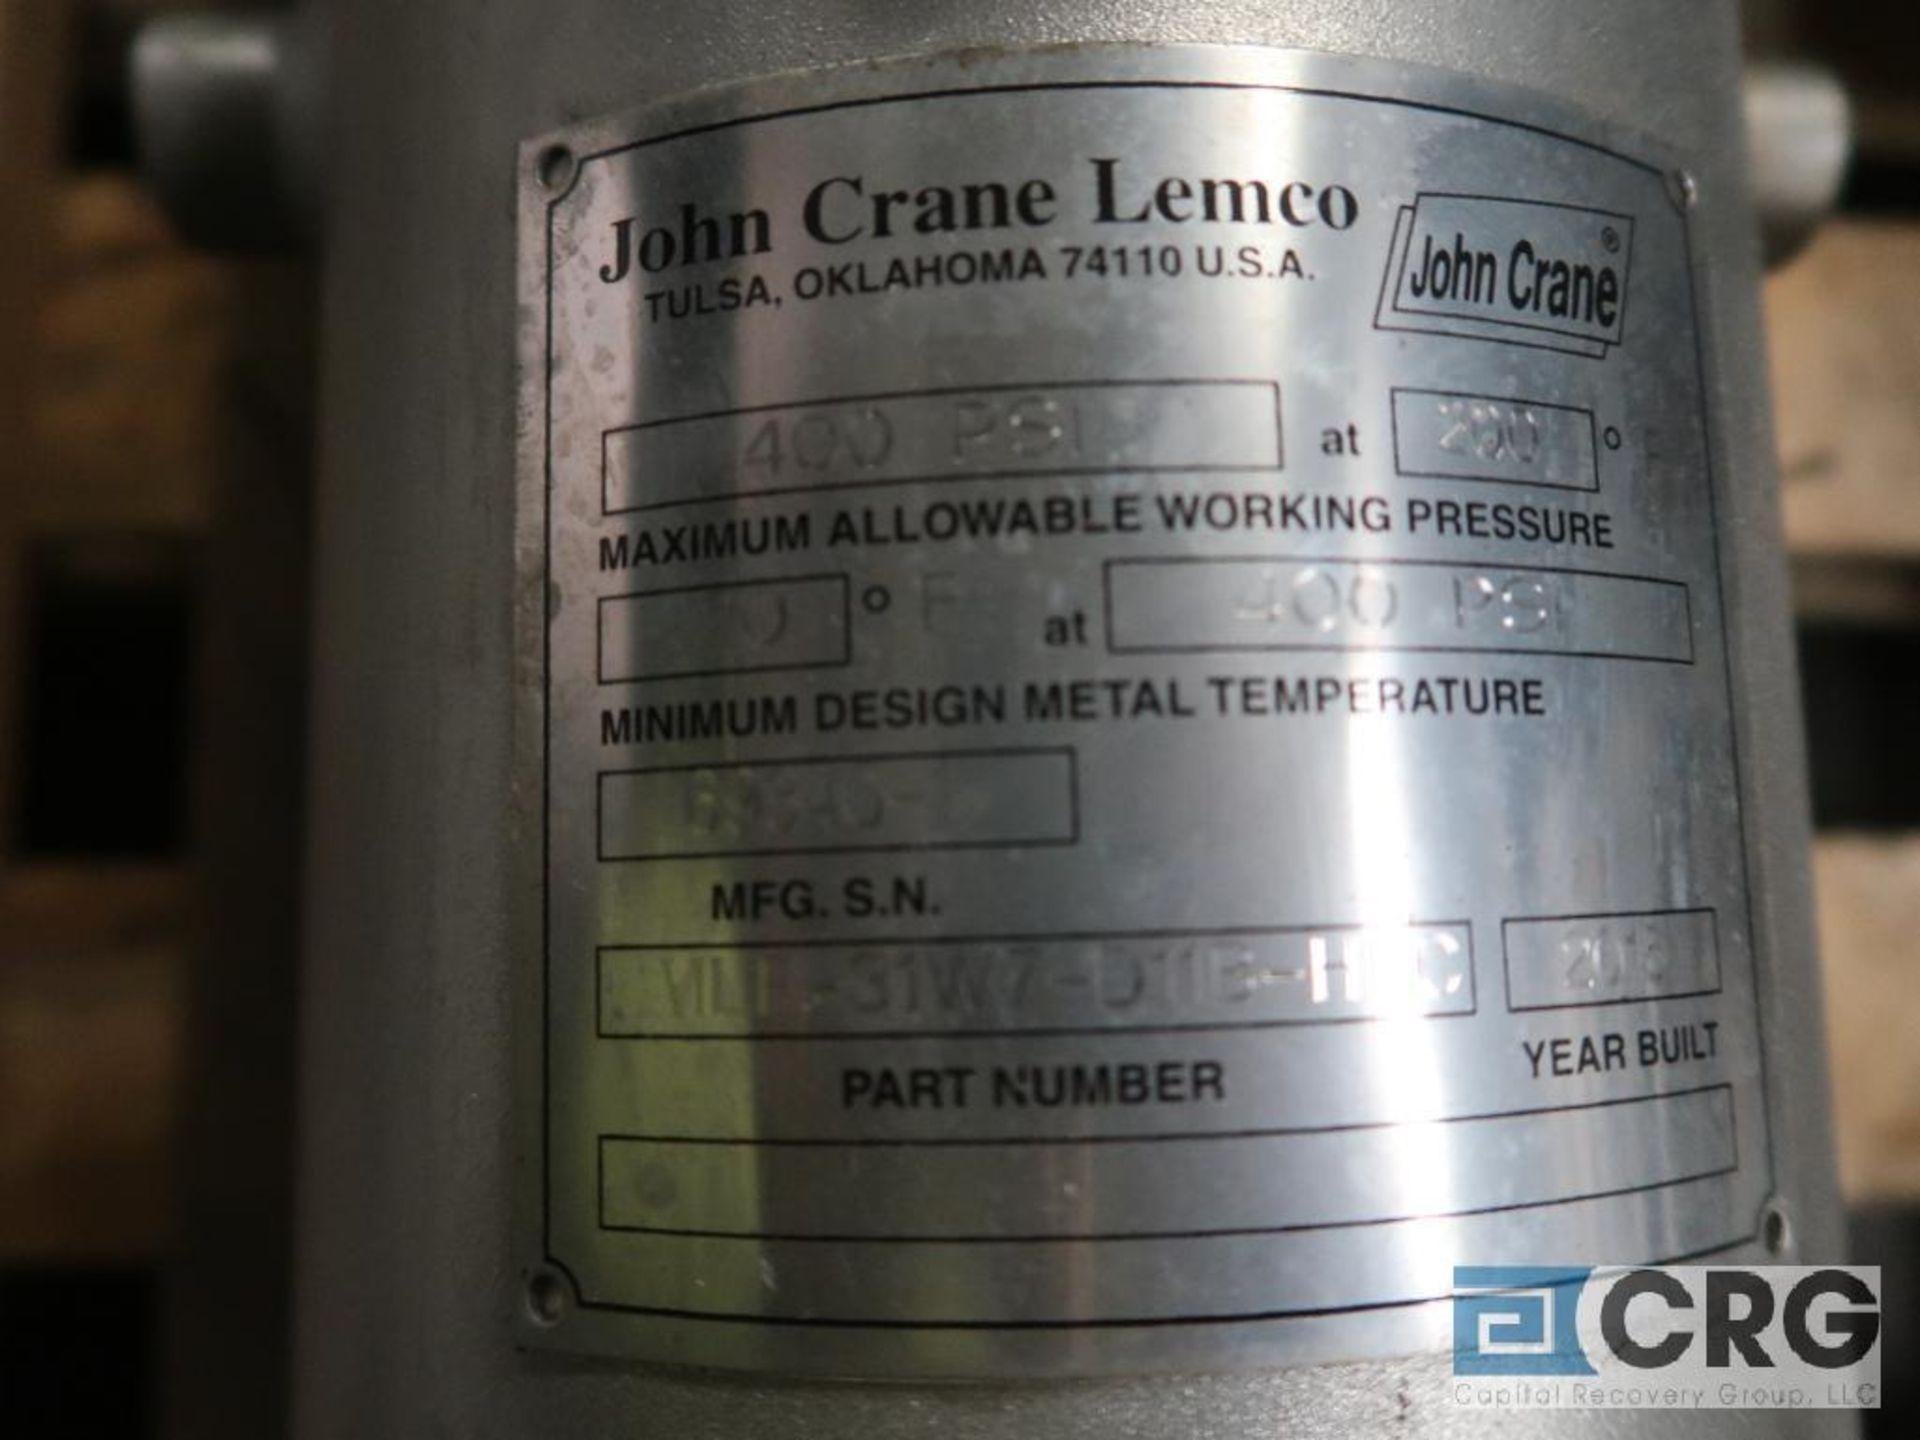 Lot of (2) stainless fluid reservoir tanks, (1) Aessteal SSE25, and (1) John Crane LMLF- - Image 3 of 3